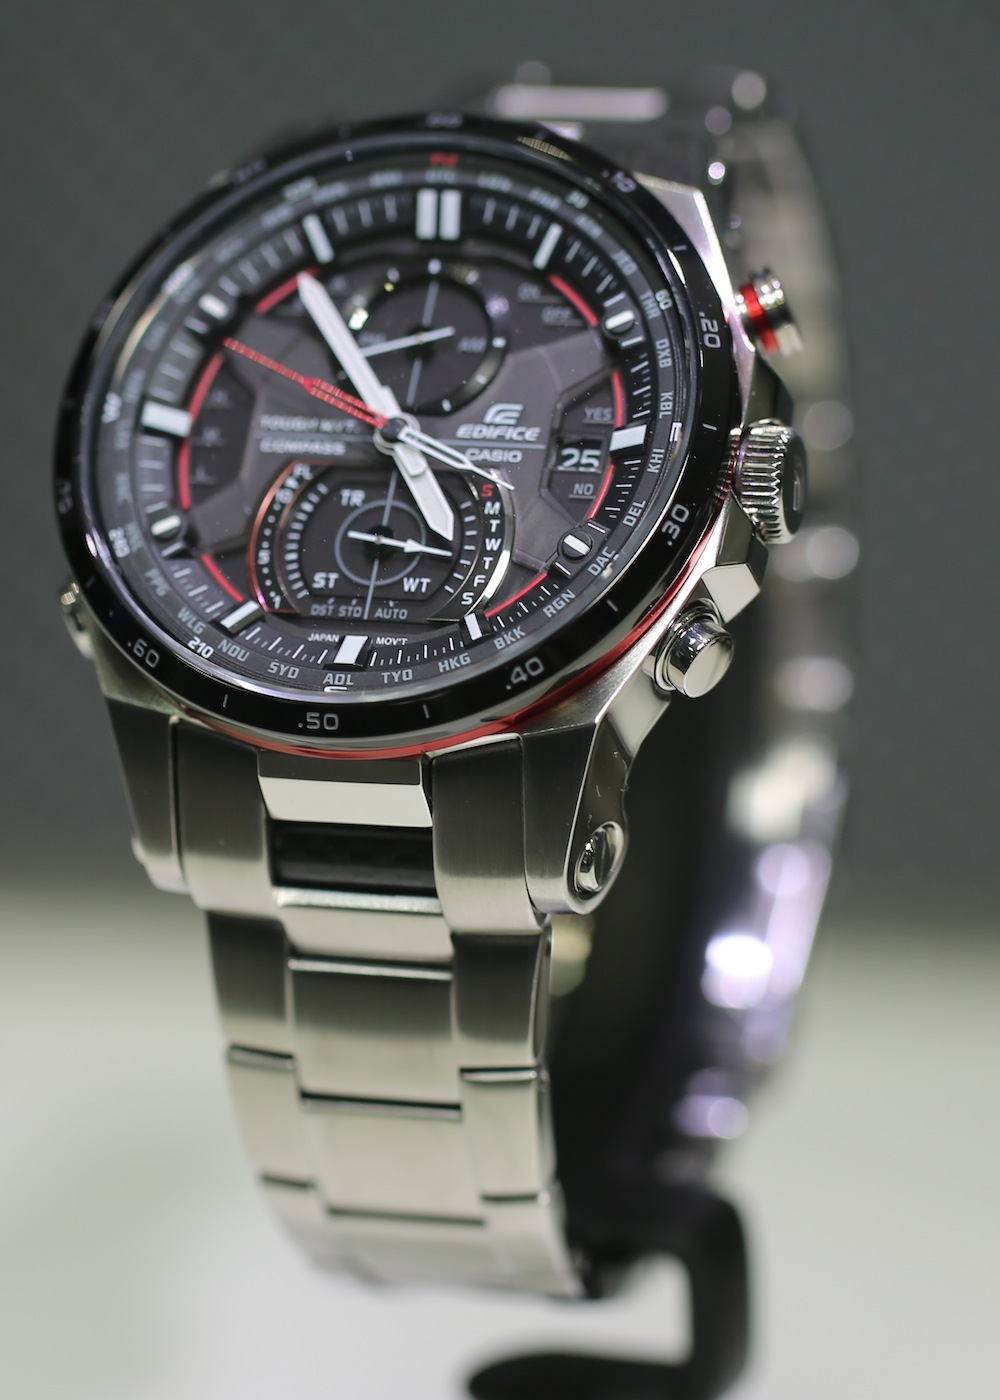 Casio Edifice EQW A1200 Sensor Chronograph Watch For 2013